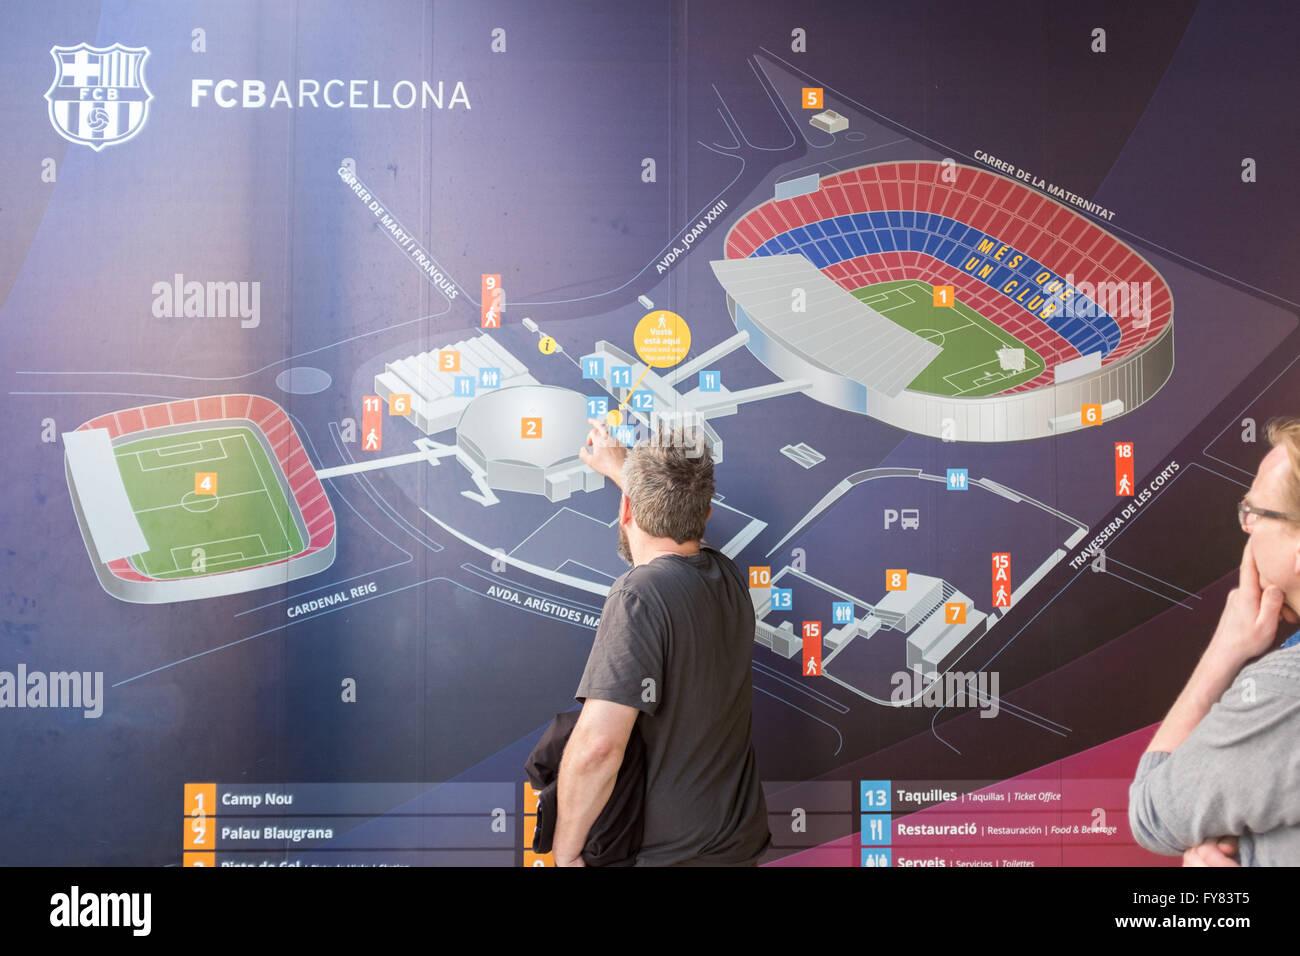 Camp Nou stadium complex map outside the stadium - Stock Image